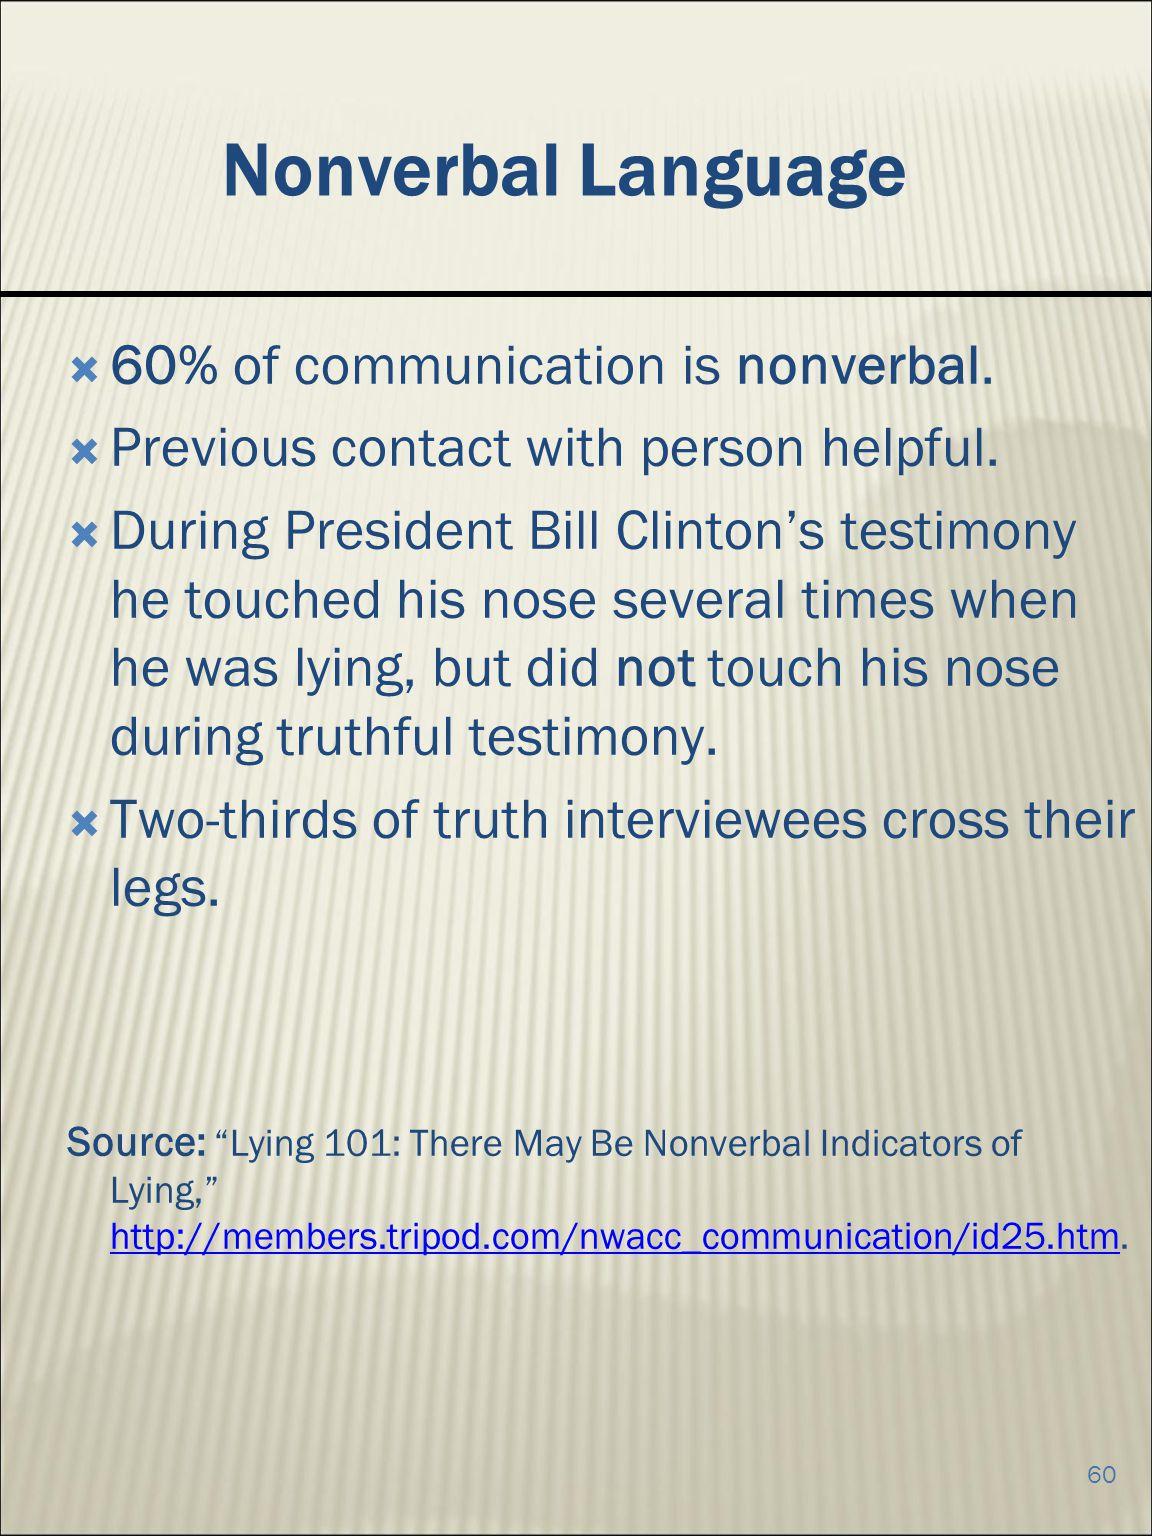 Nonverbal Language 60% of communication is nonverbal.